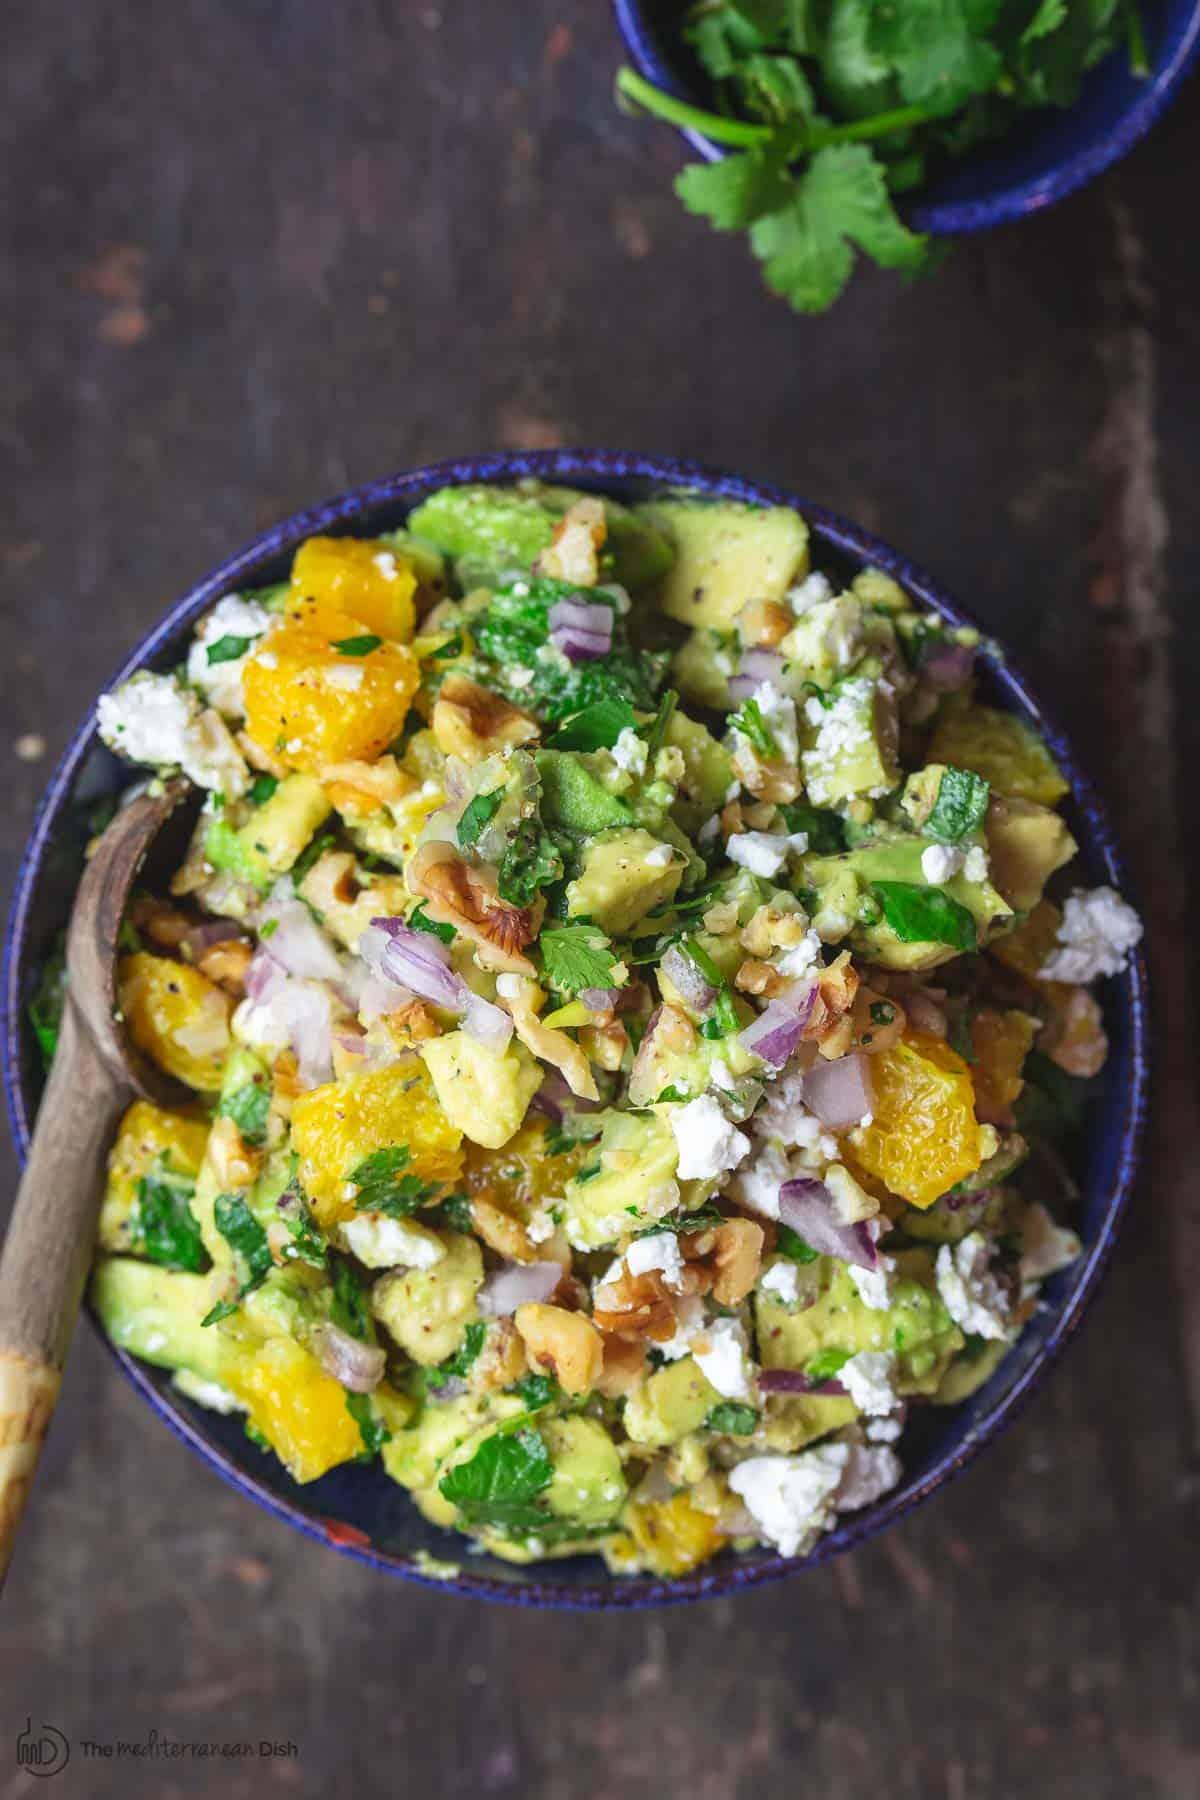 Avocado Dip with a Mediterranean twist including oranges, fresh herbs, feta and walnuts